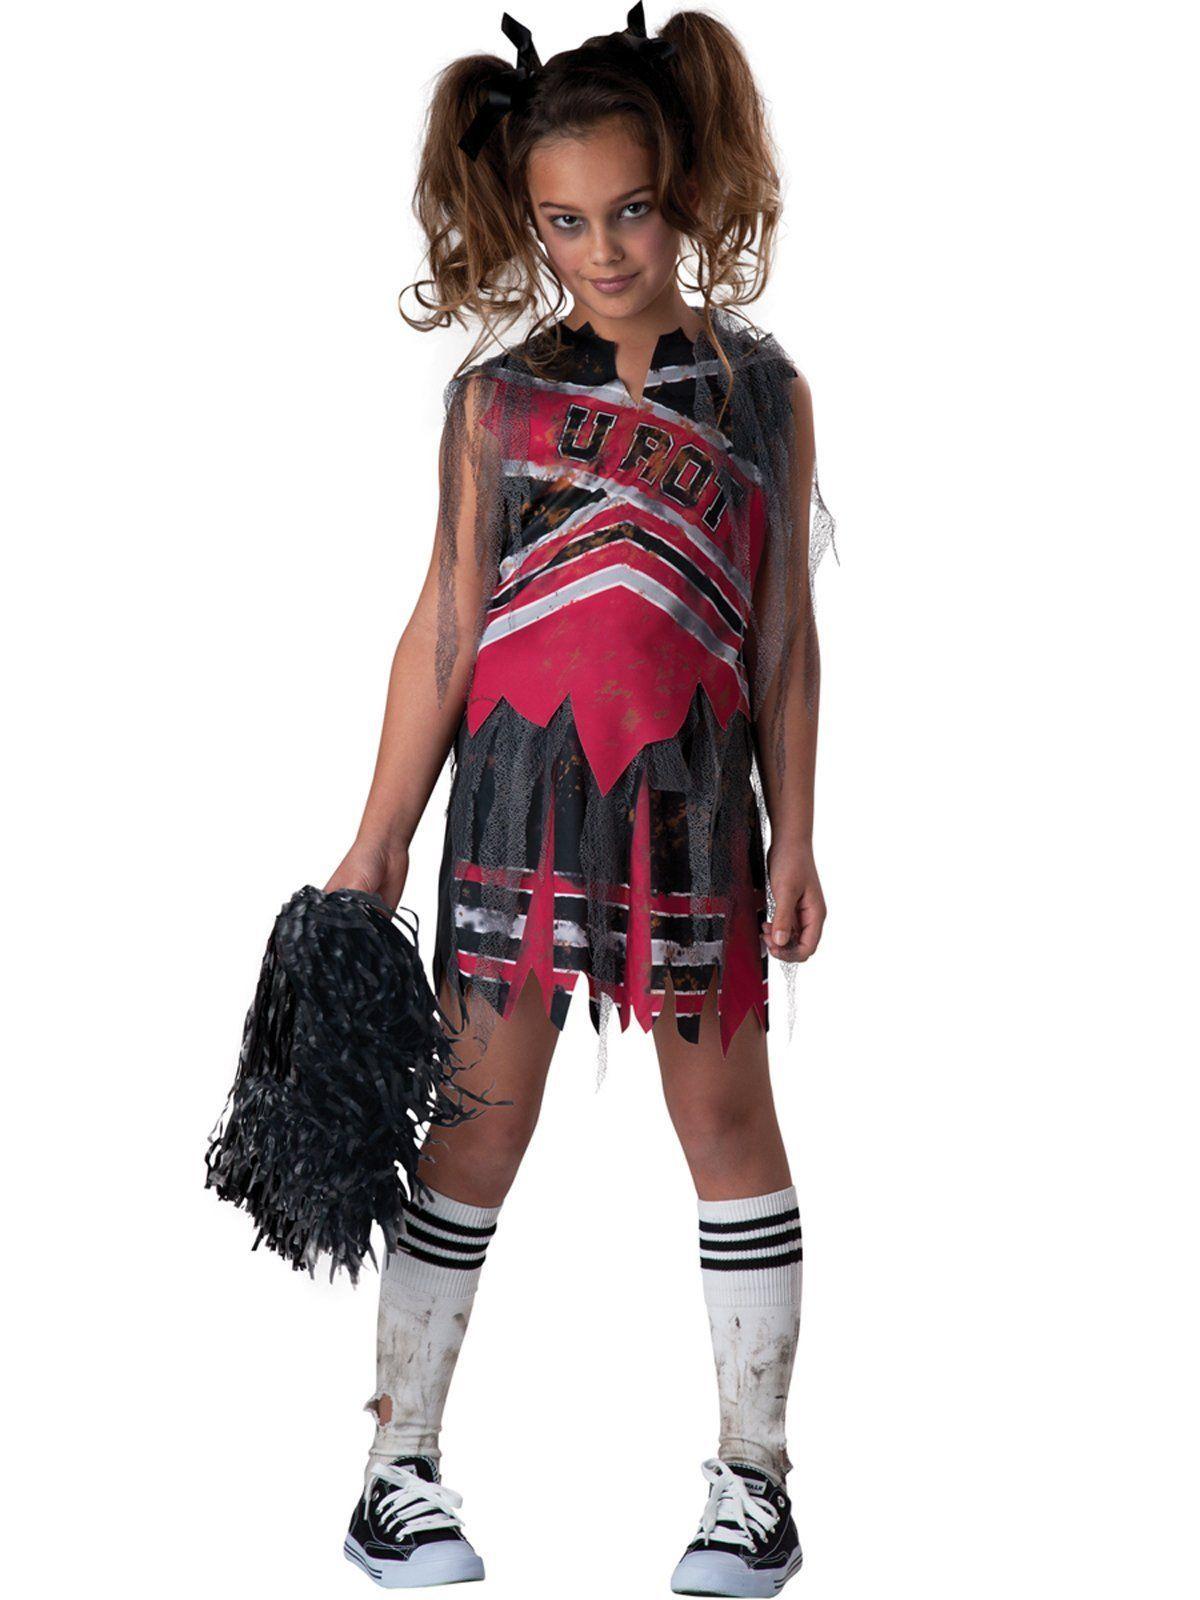 Spiritless Cheerleader Child Costume Products